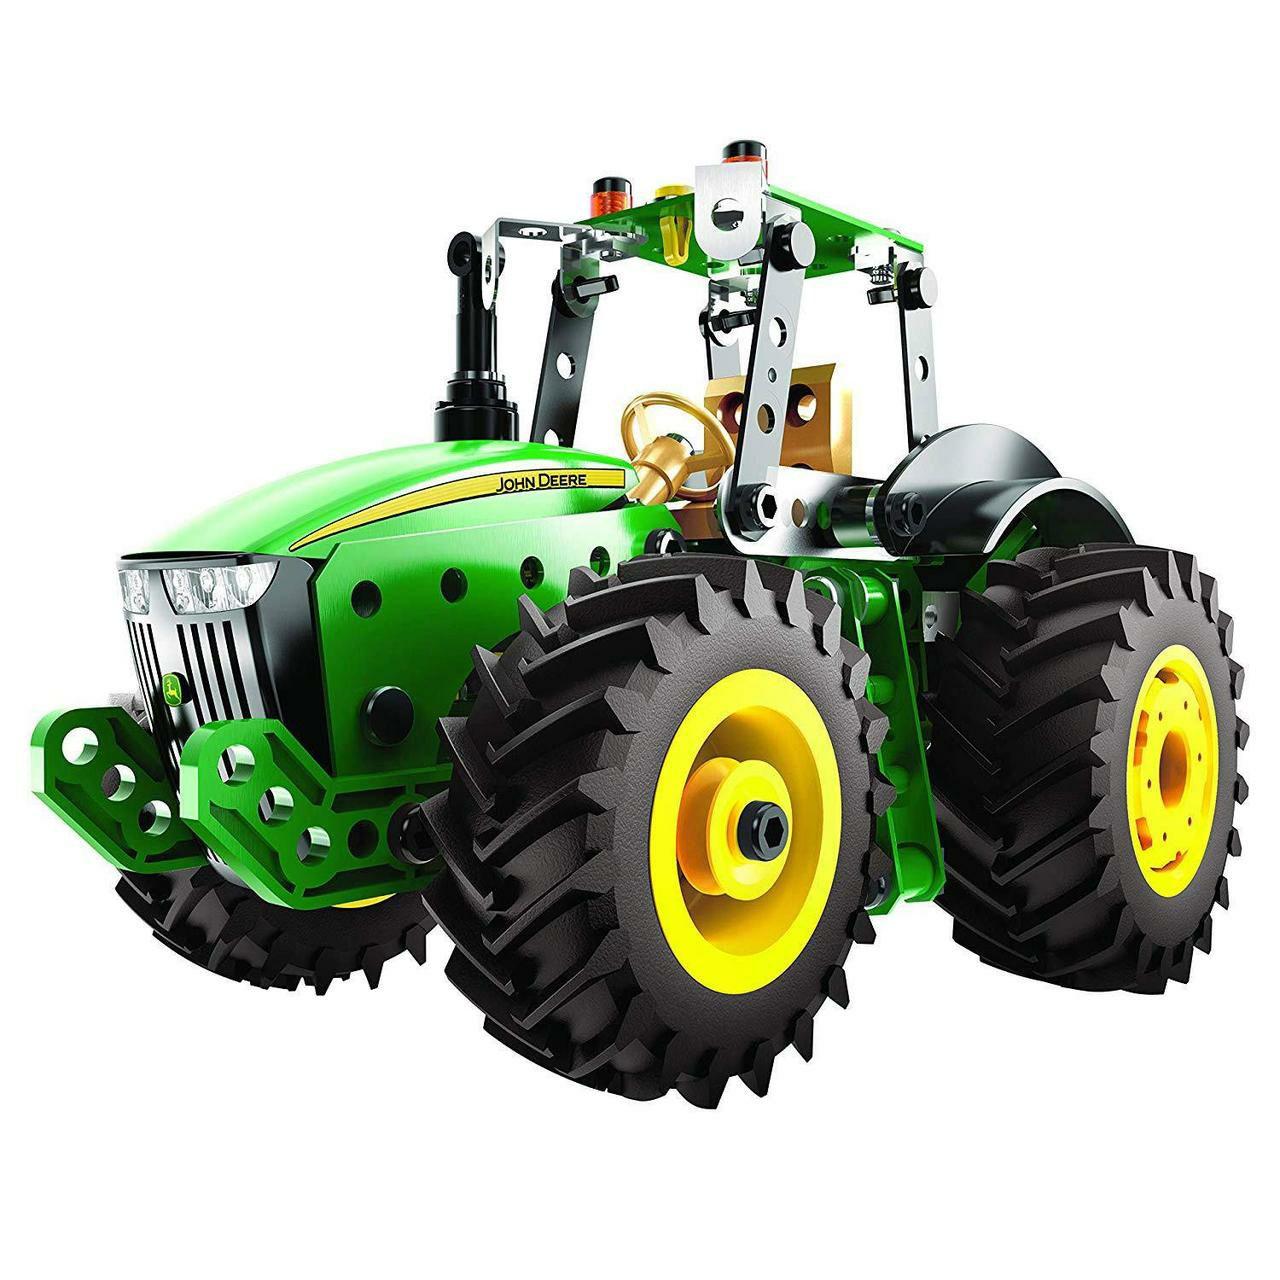 Meccano John Deere 8R Series Tractor Vehicle Construction Set £19.50 delivered @ toyz-plus eBay